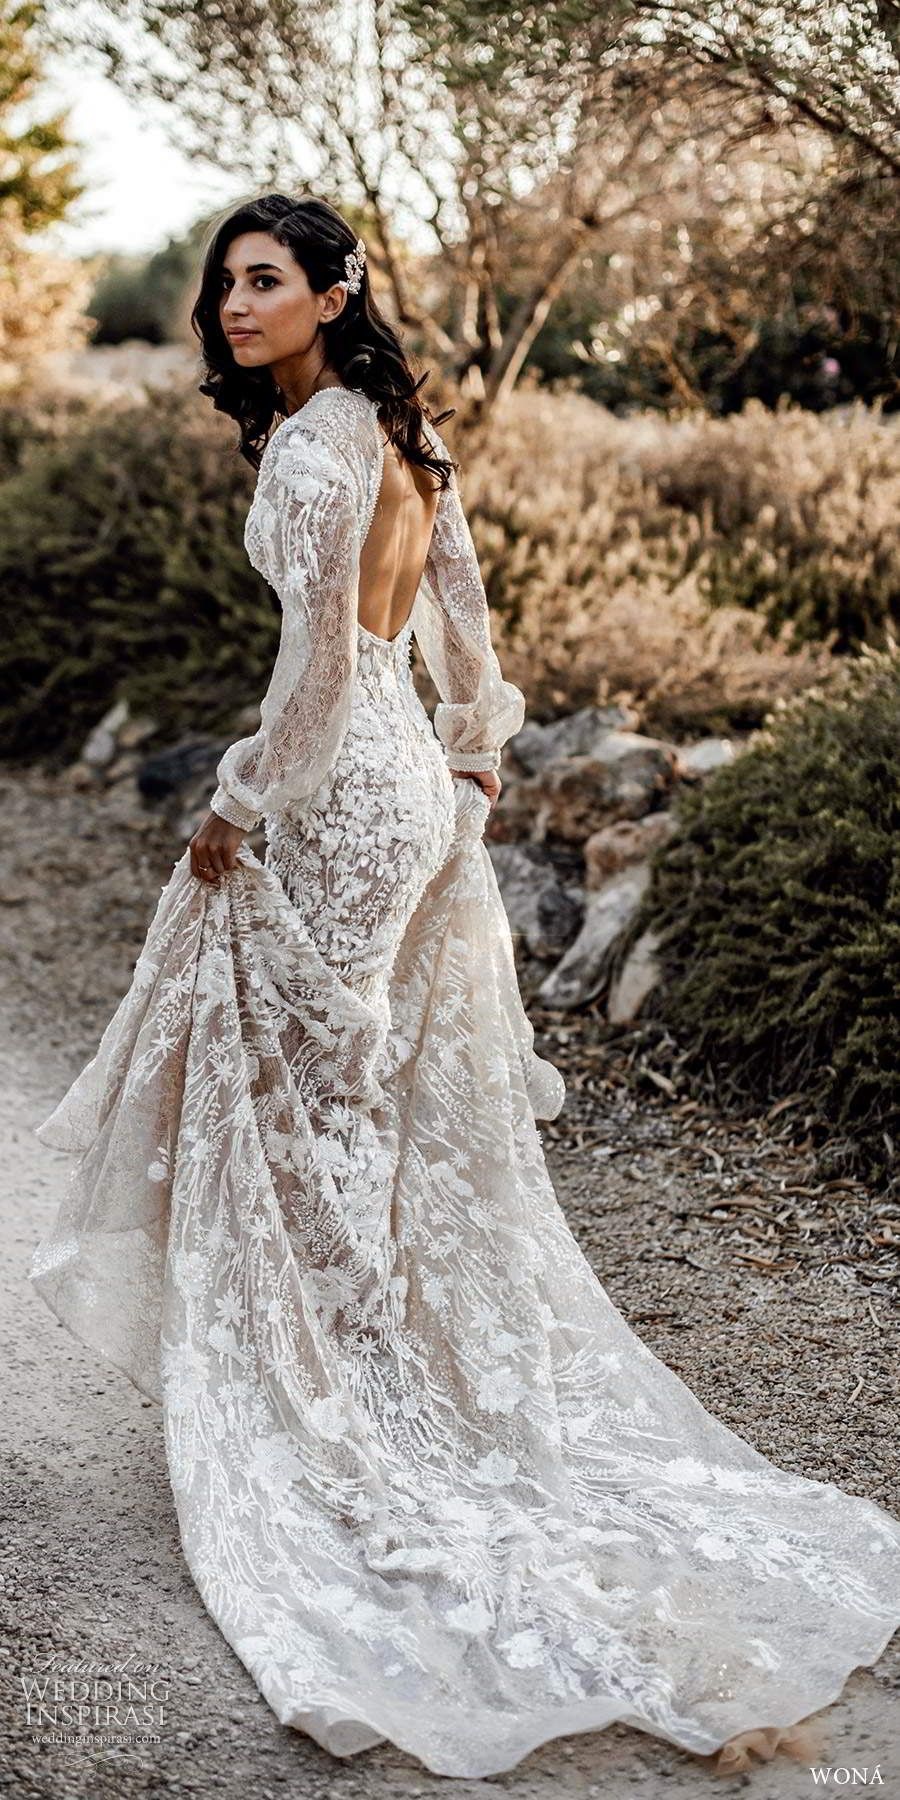 Wona Wedding Dresses 2020 Love Stories Vol 1 Bridal Collection Wedding Inspirasi Lace Wedding Dress With Sleeves Long Sleeve Wedding Dress Lace Wedding Dress Long Sleeve [ 1800 x 900 Pixel ]